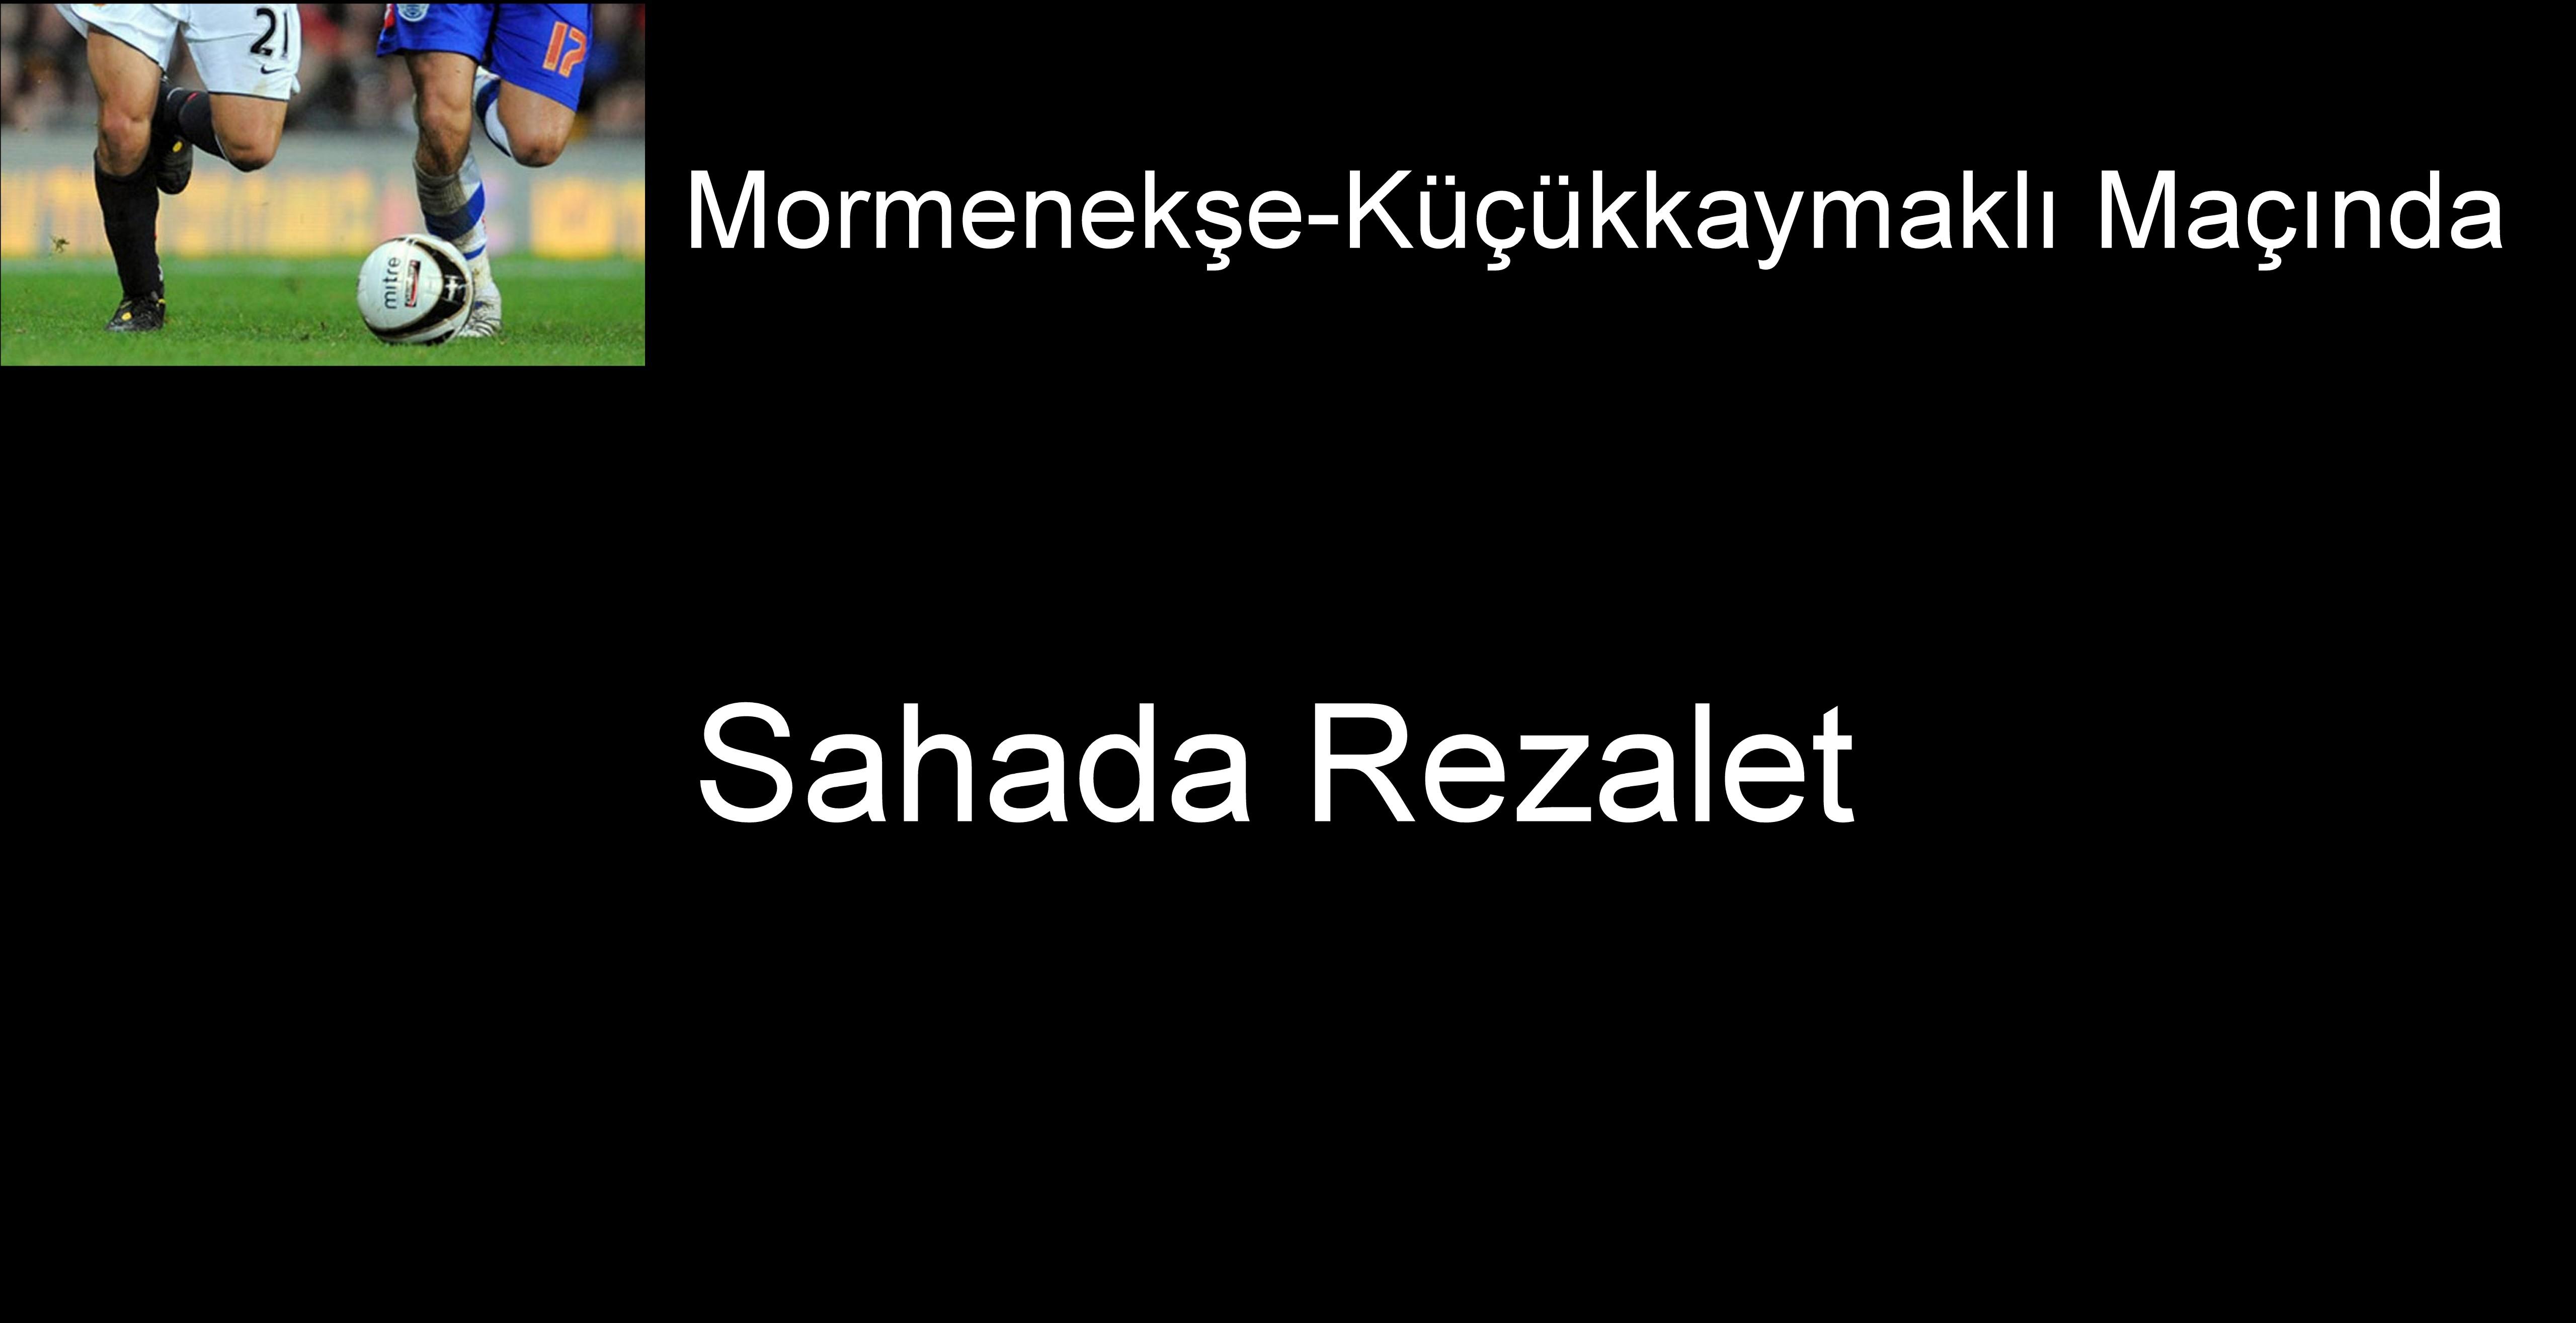 SAHADA REZALET